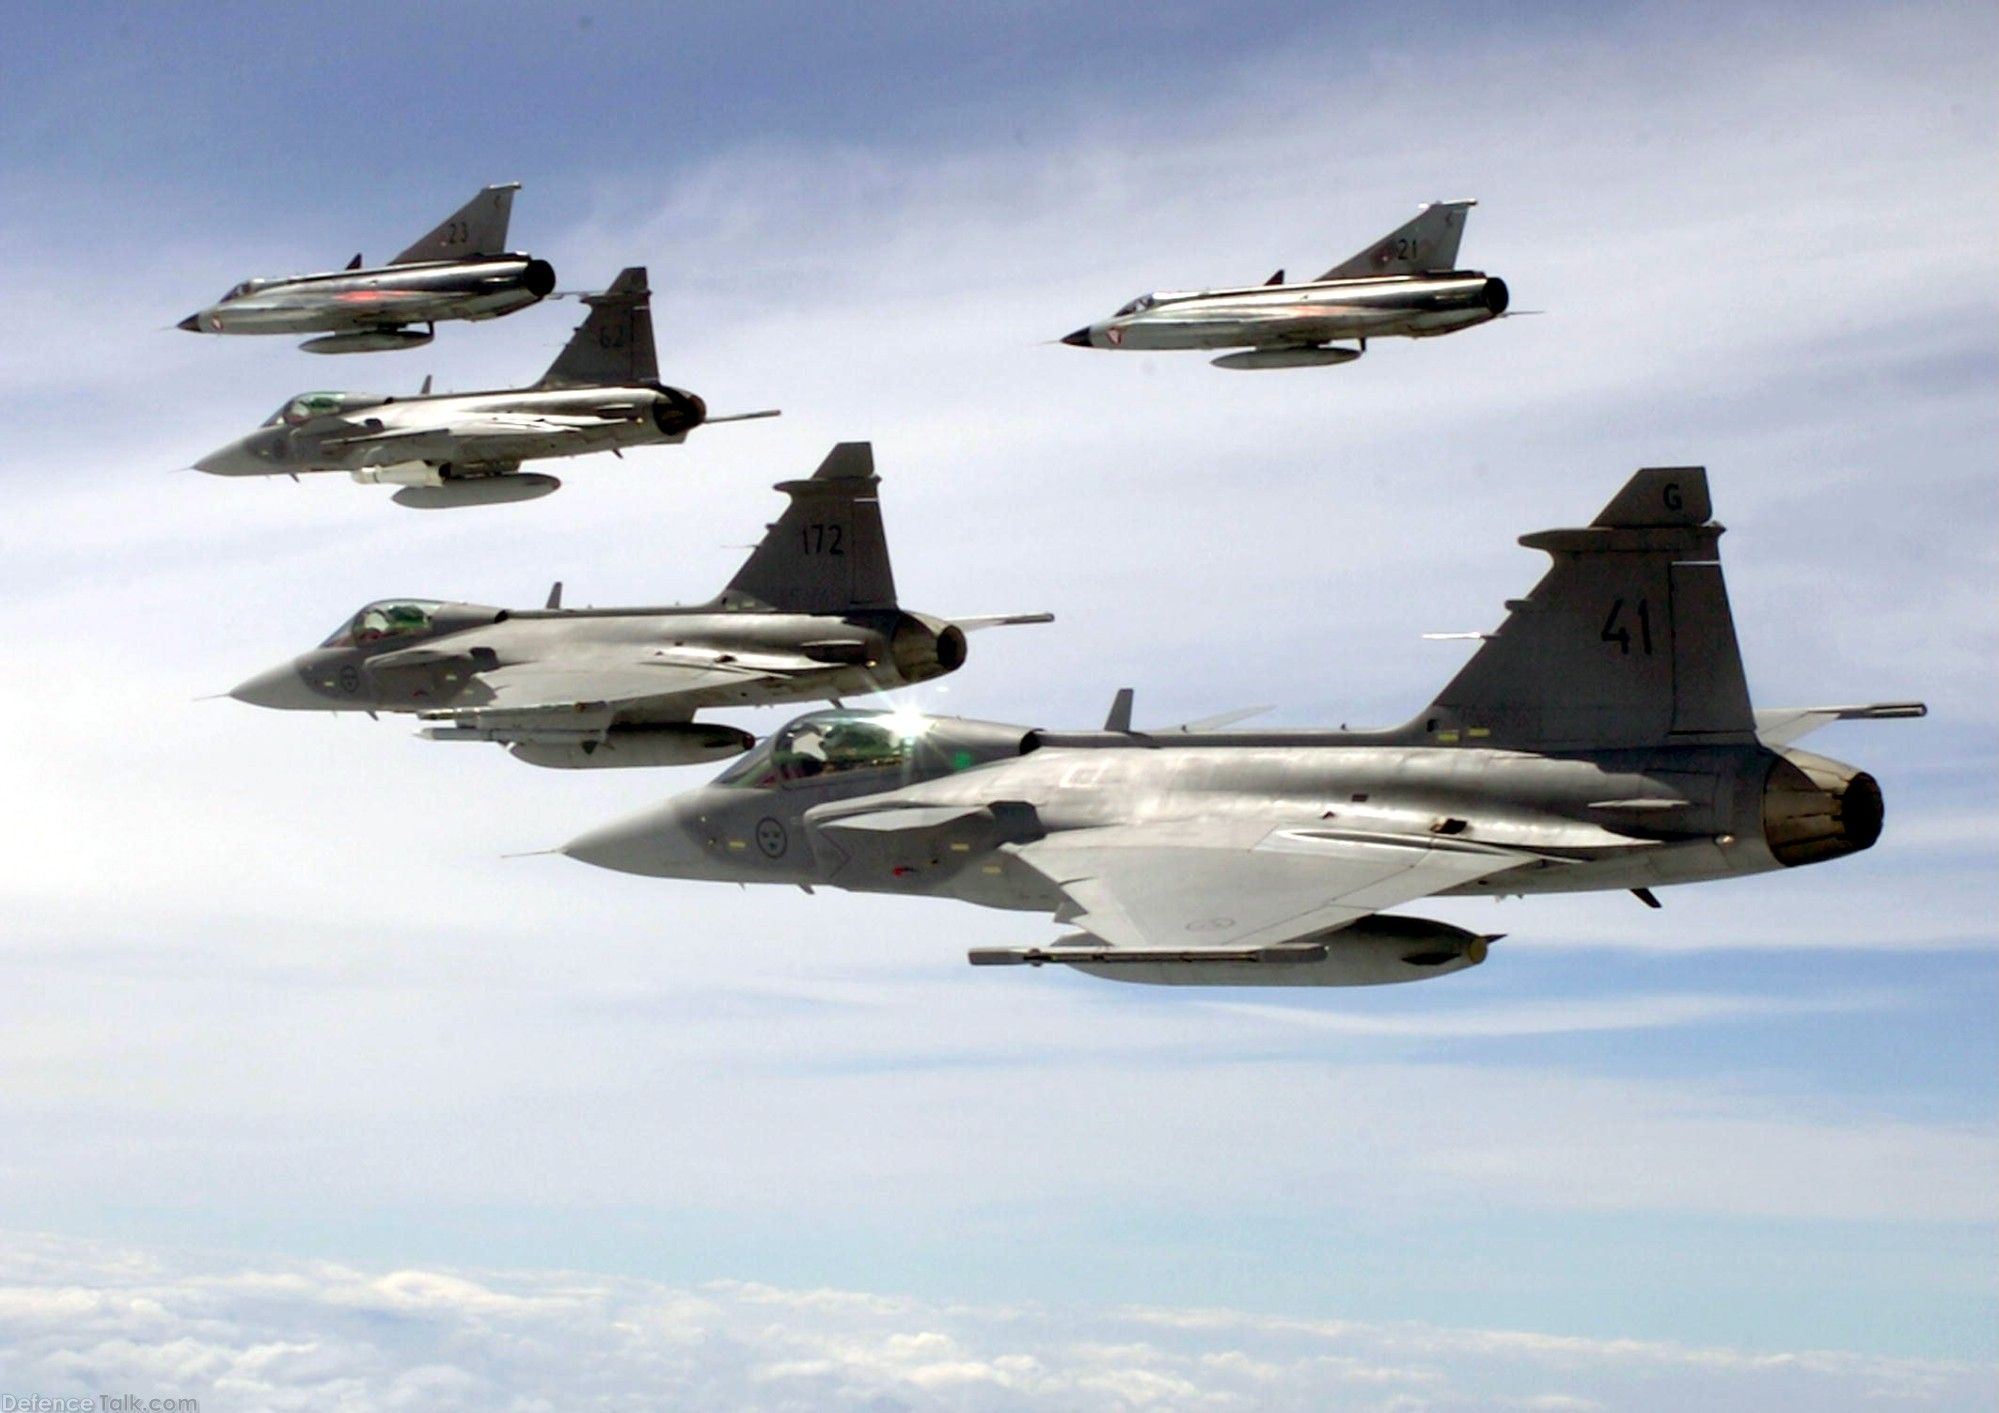 Draken and Gripen formation